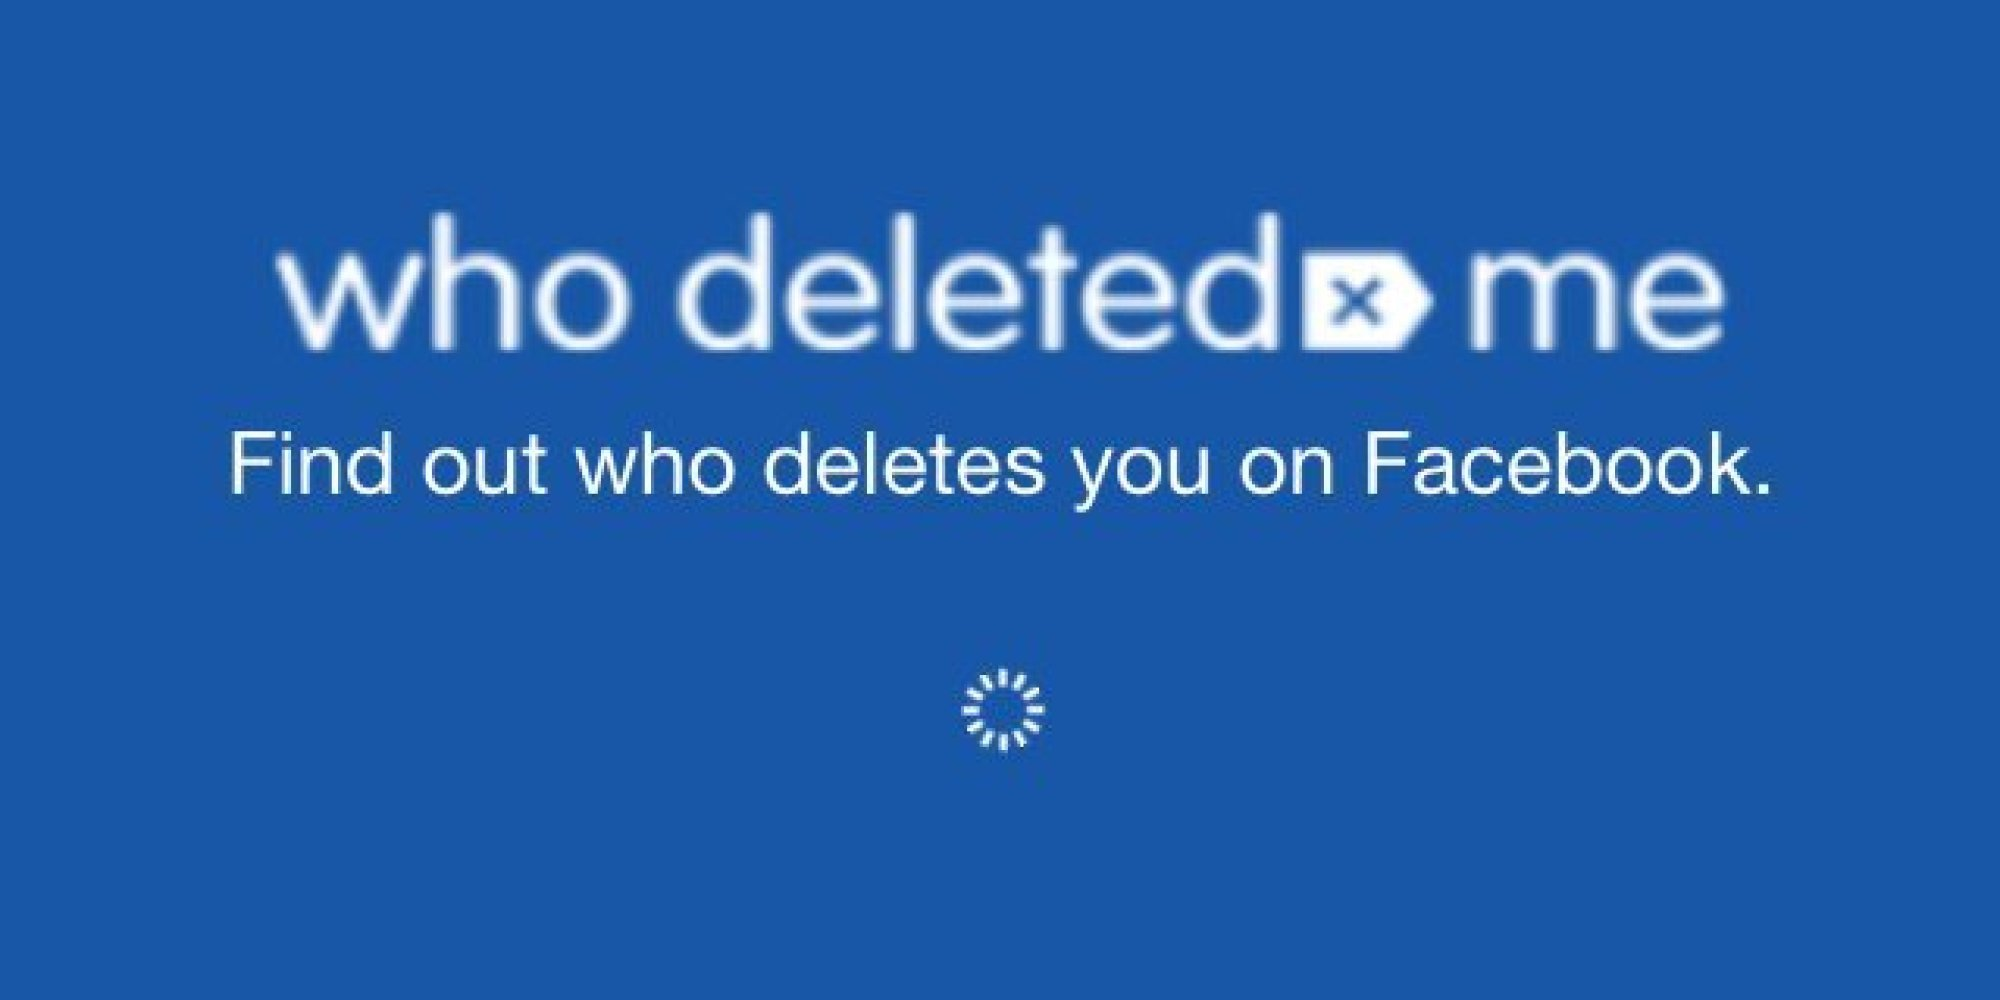 'Soi' xem ai đã unfriend bạn trên Facebook